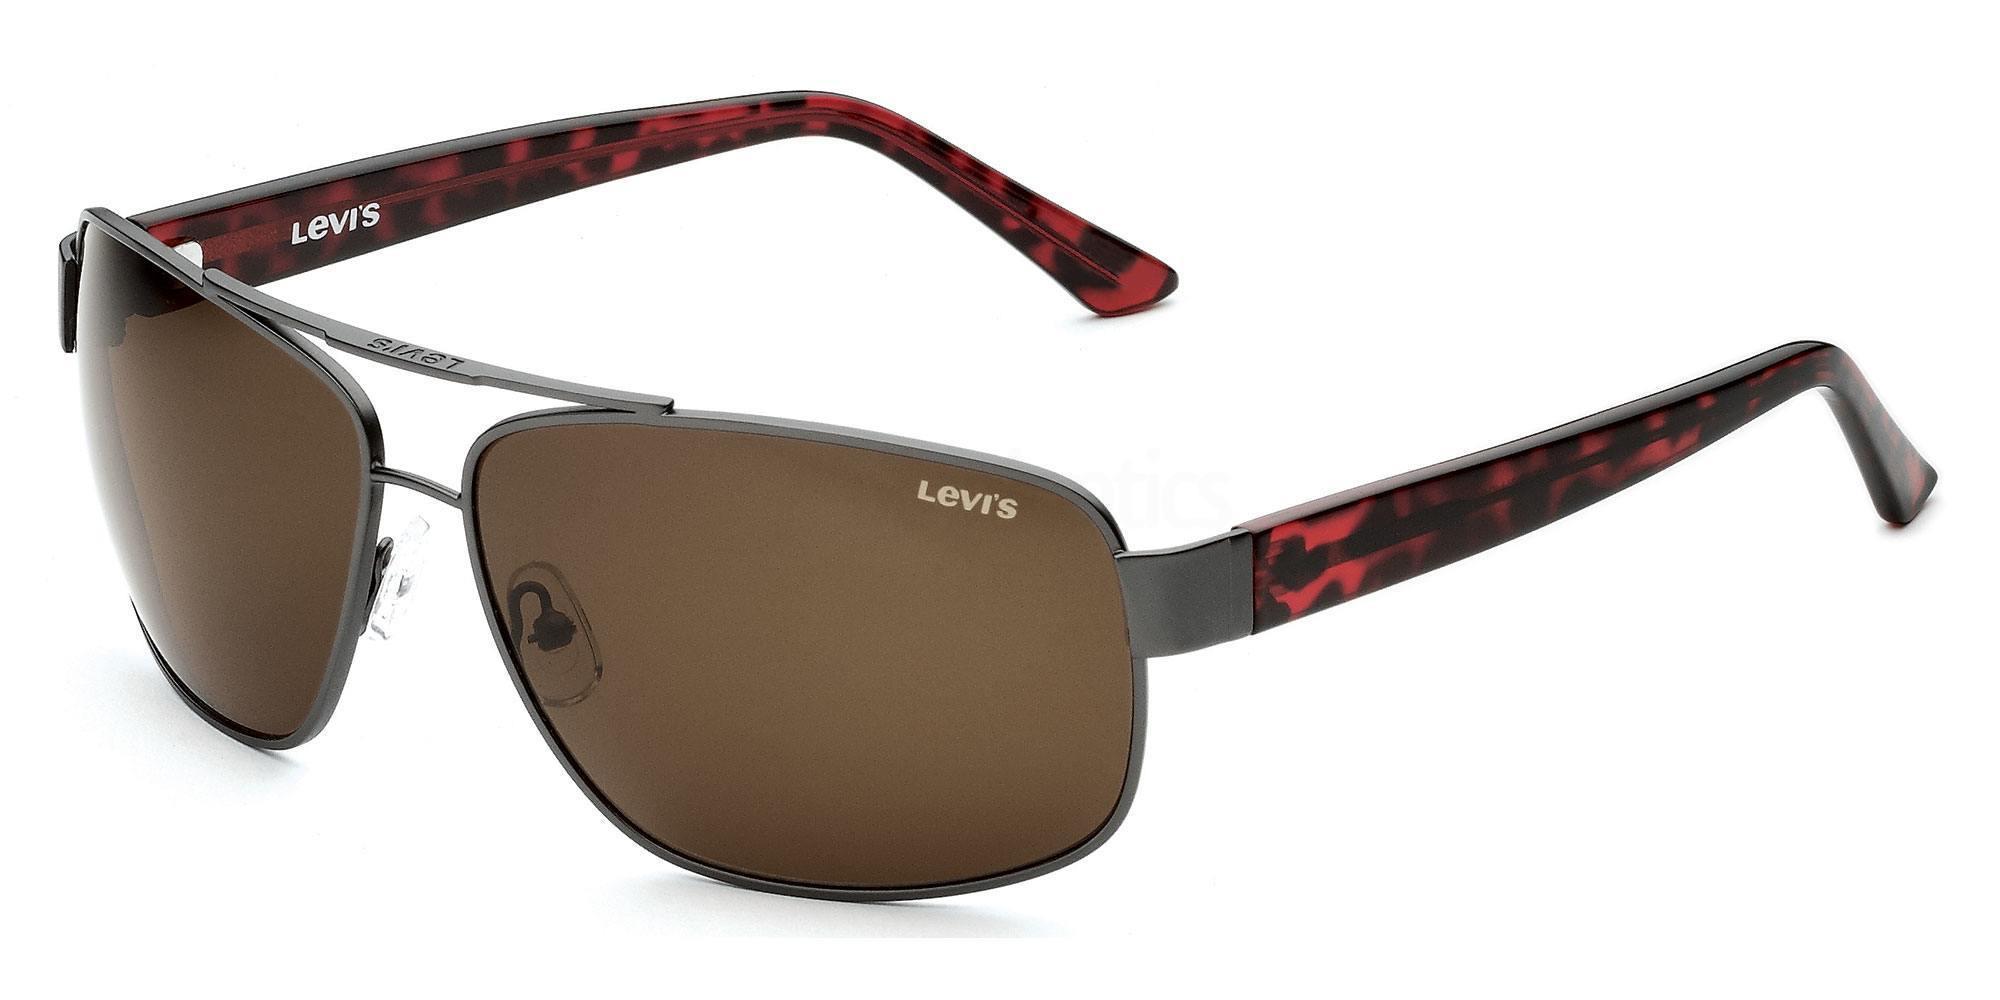 LO22376/01 LO22376 , Levi's Eyewear